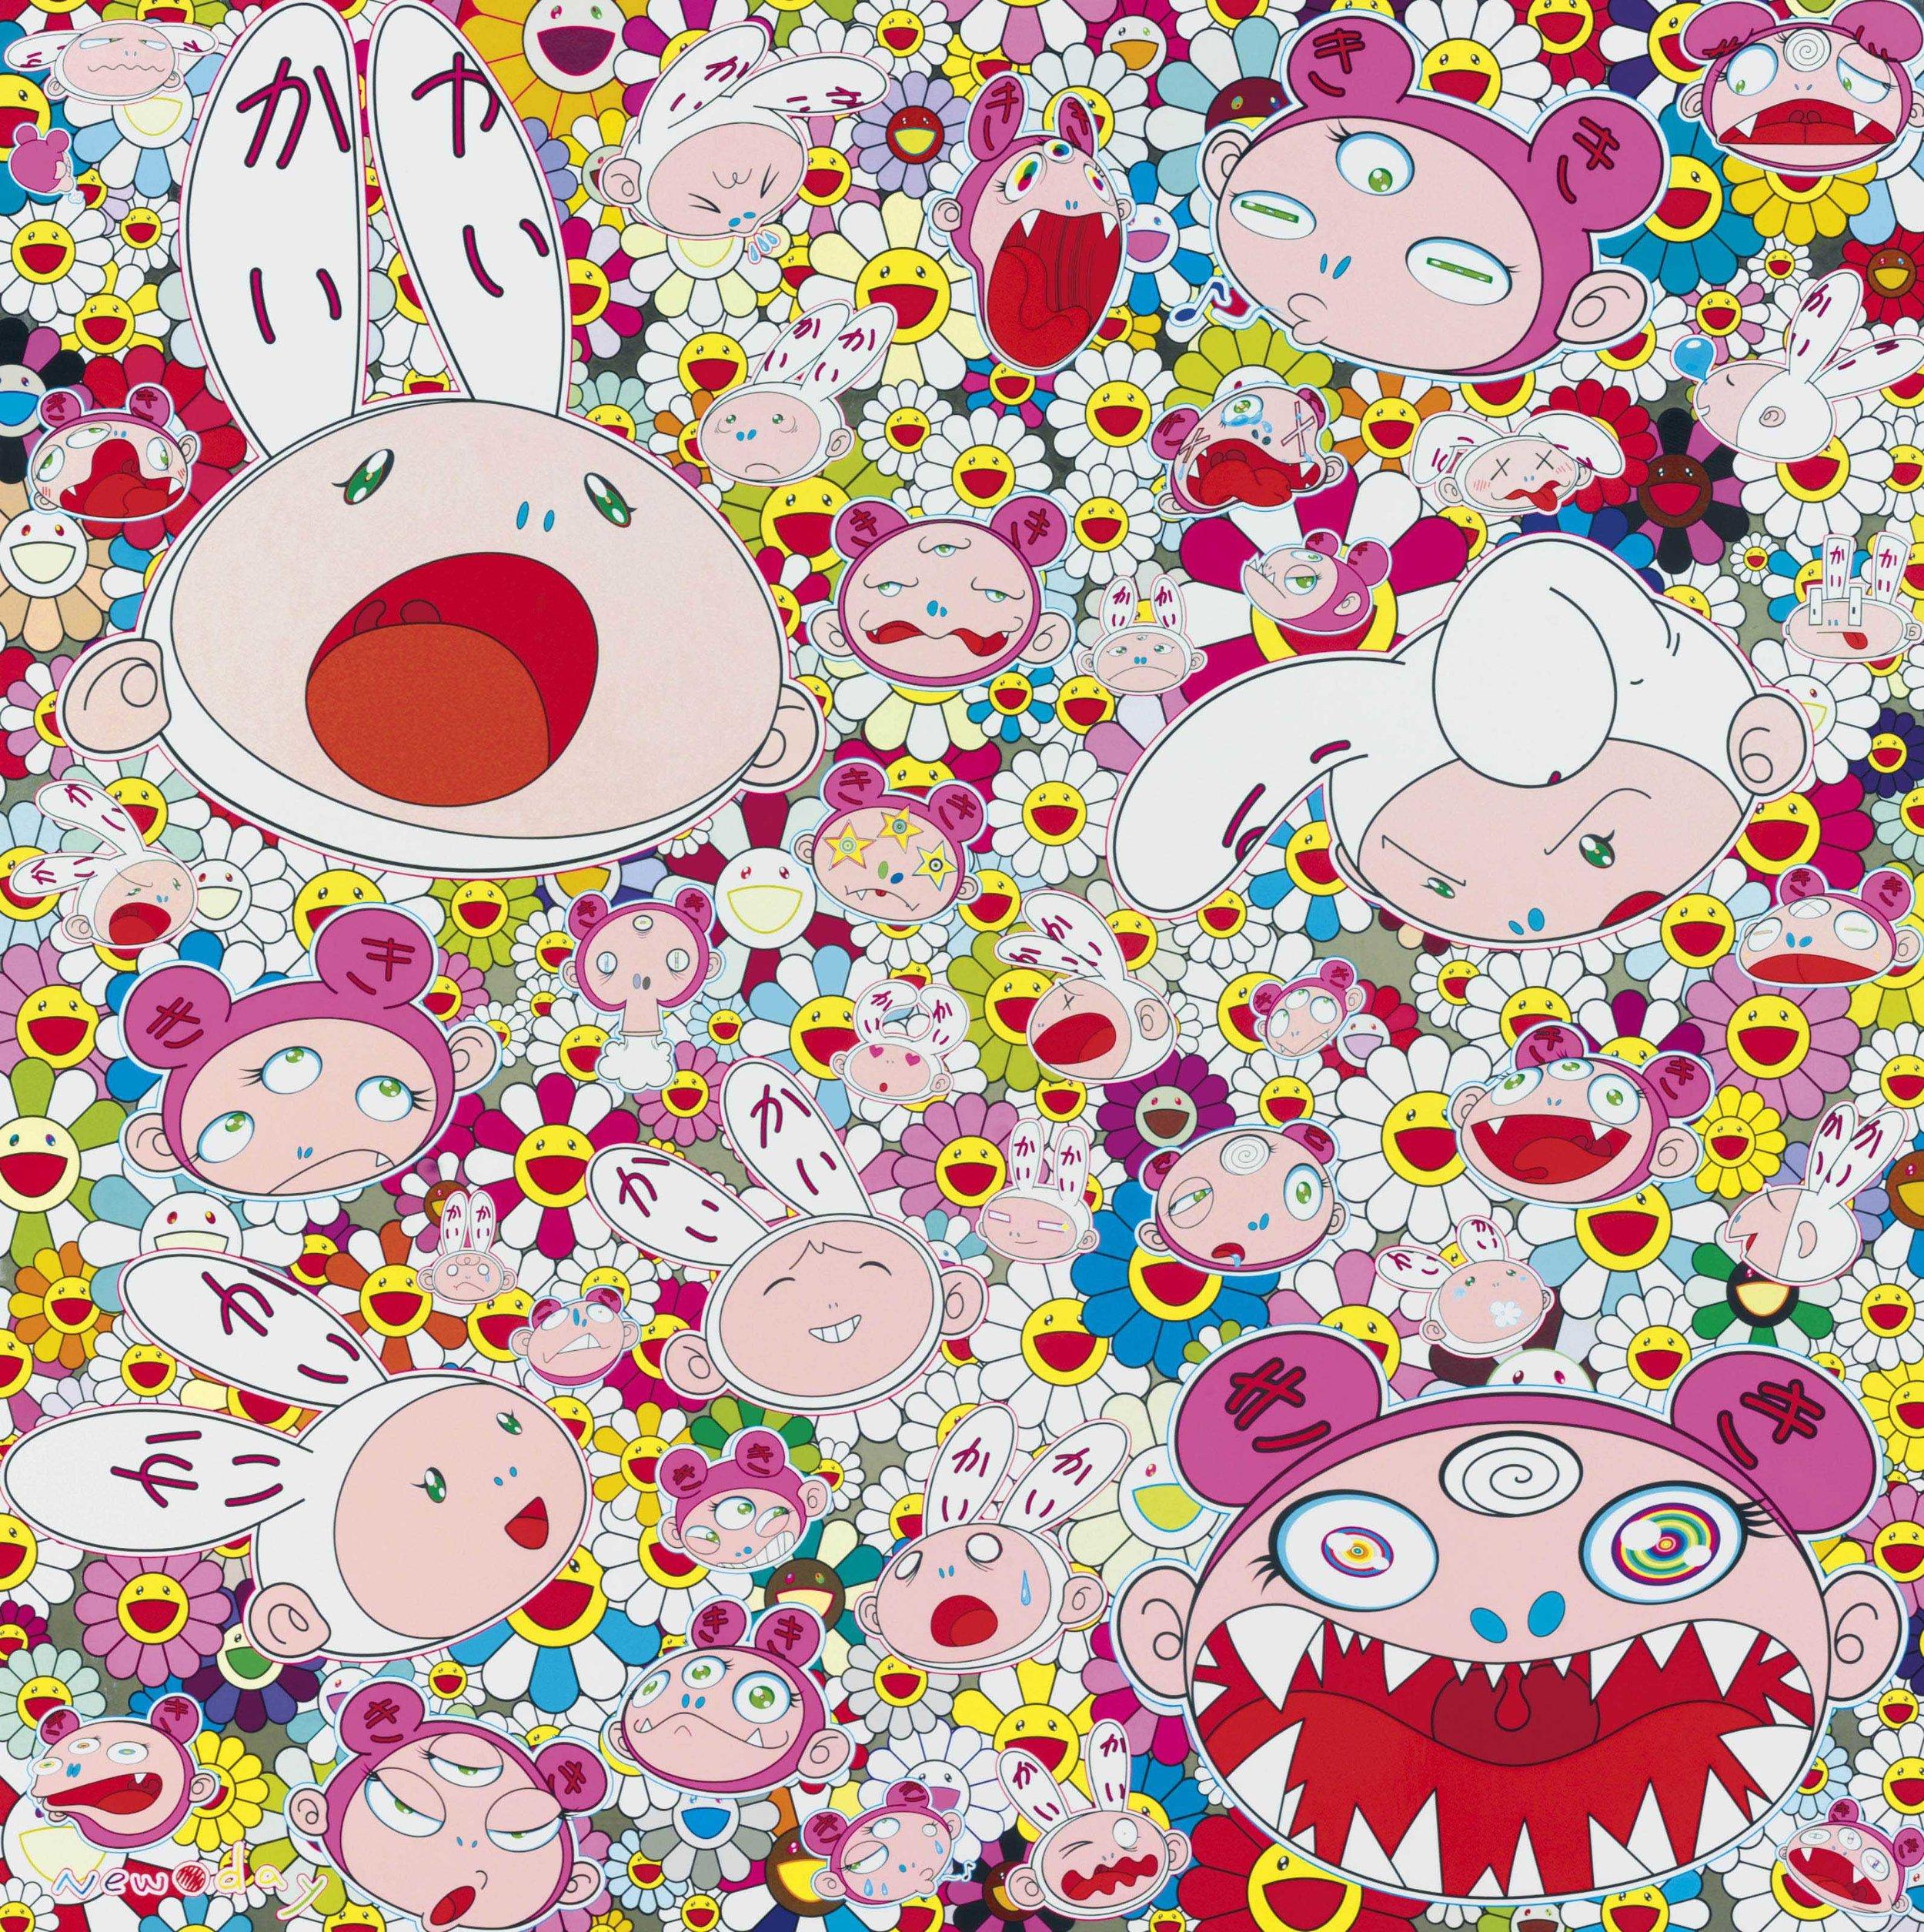 2011_NYR_02482_0207_000(takashi_murakami_new_day_kaikai_and_kiki_faces_all-over).jpg